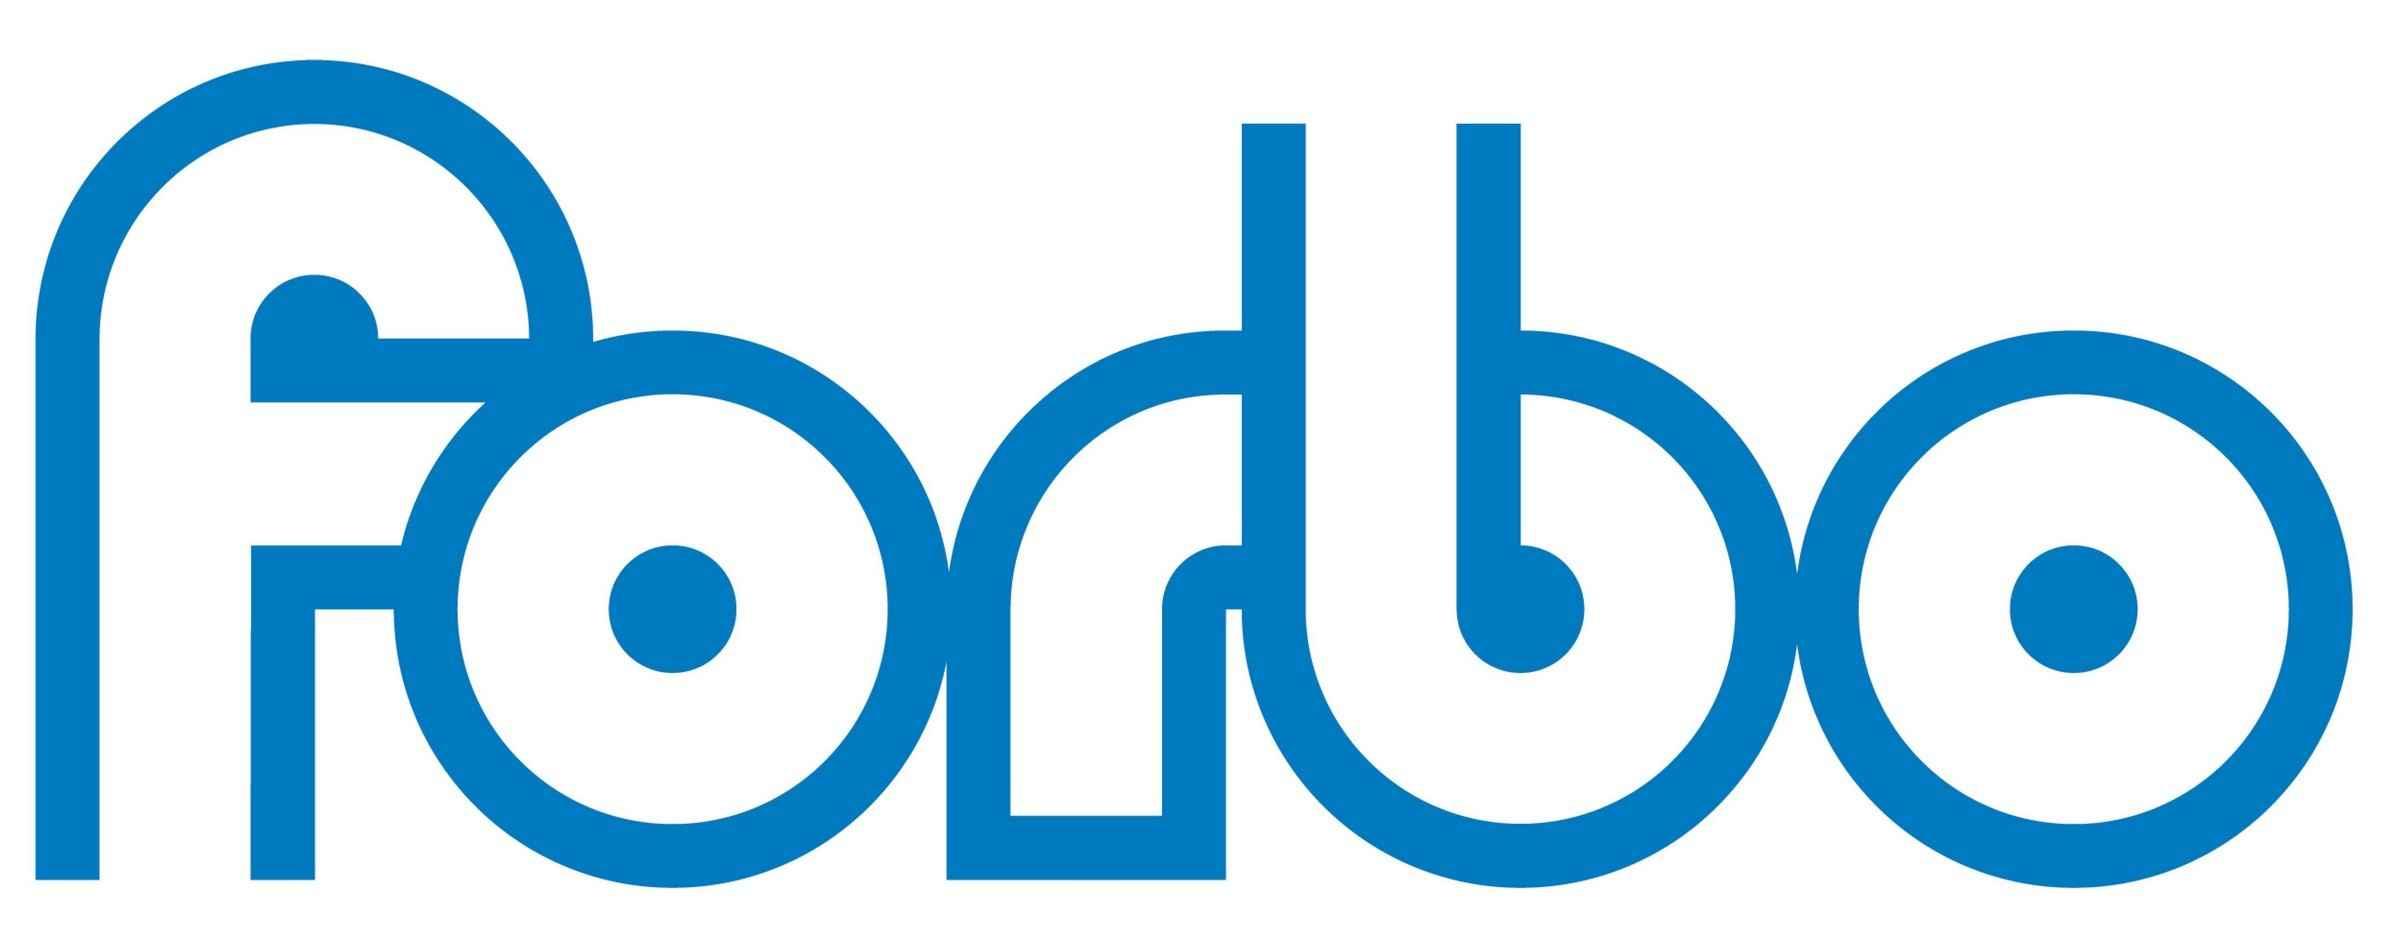 forbo logo eps pdf vector eps free download logo icons clipart rh freelogovectors net logo psychology logo eps files